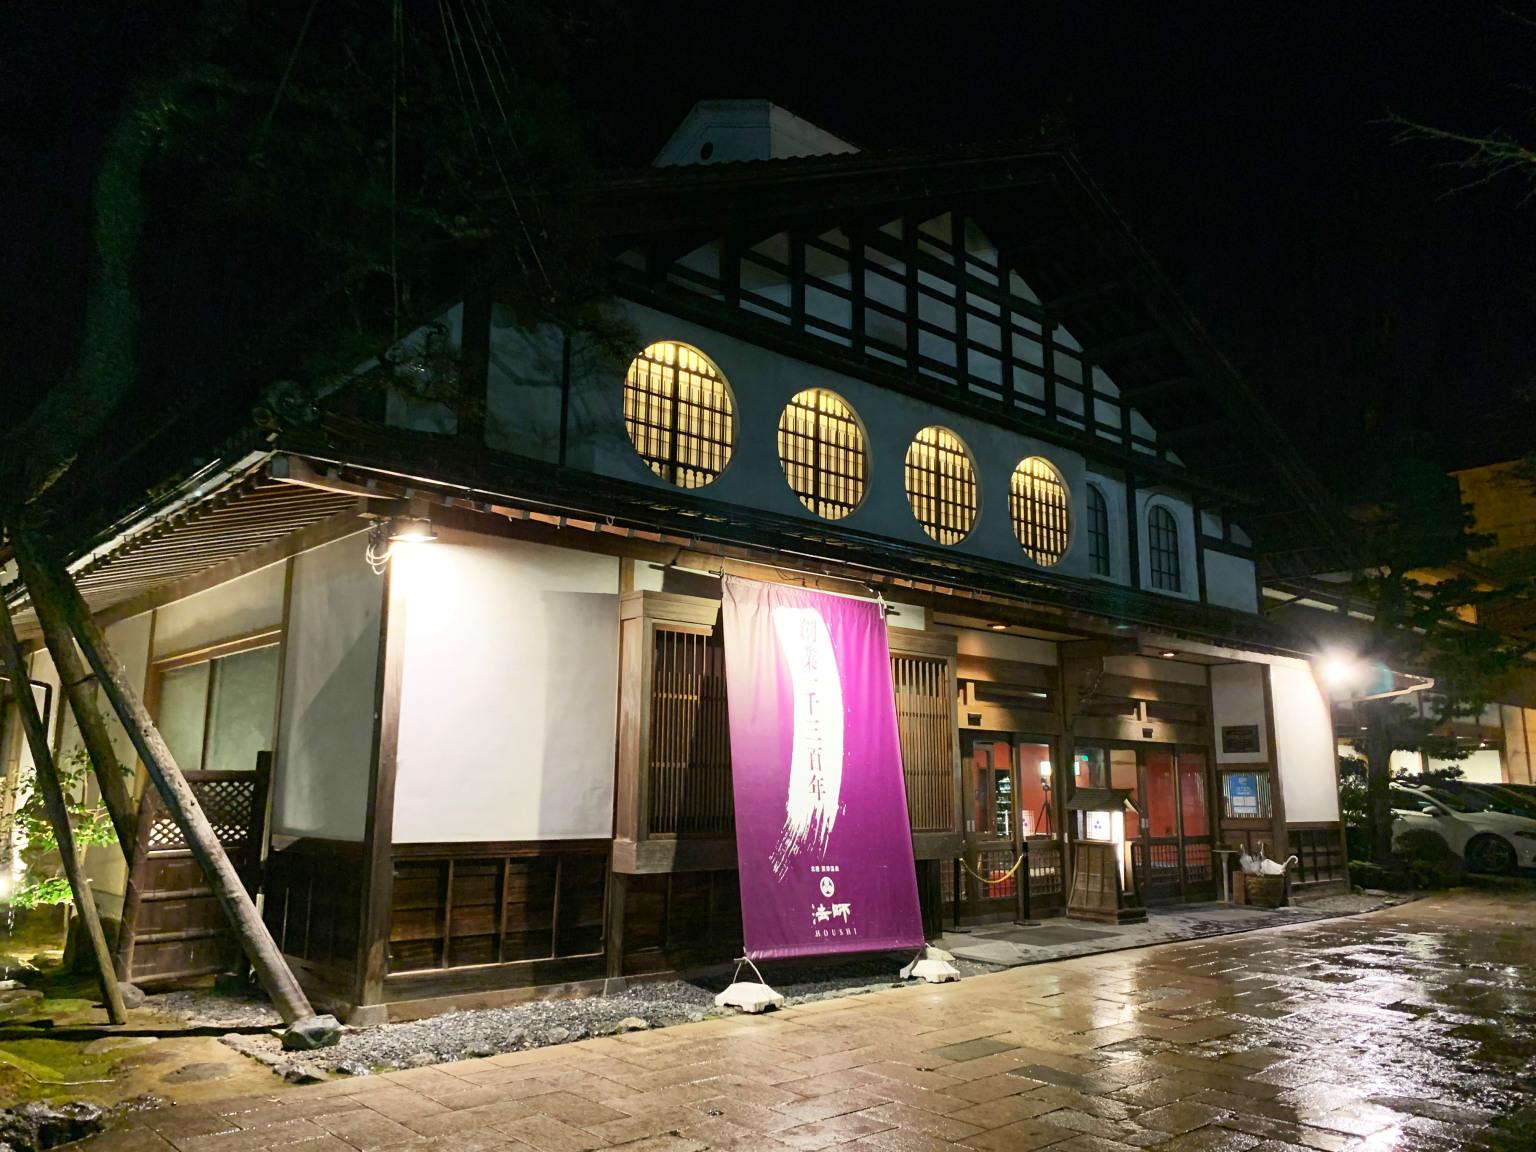 Houshi-Ryokan-onsen-hotel-oldest-in-world-Japan-business-travel-Hoshi-accommodation-stay-photos-reviews-Ishikawa-2.jpg